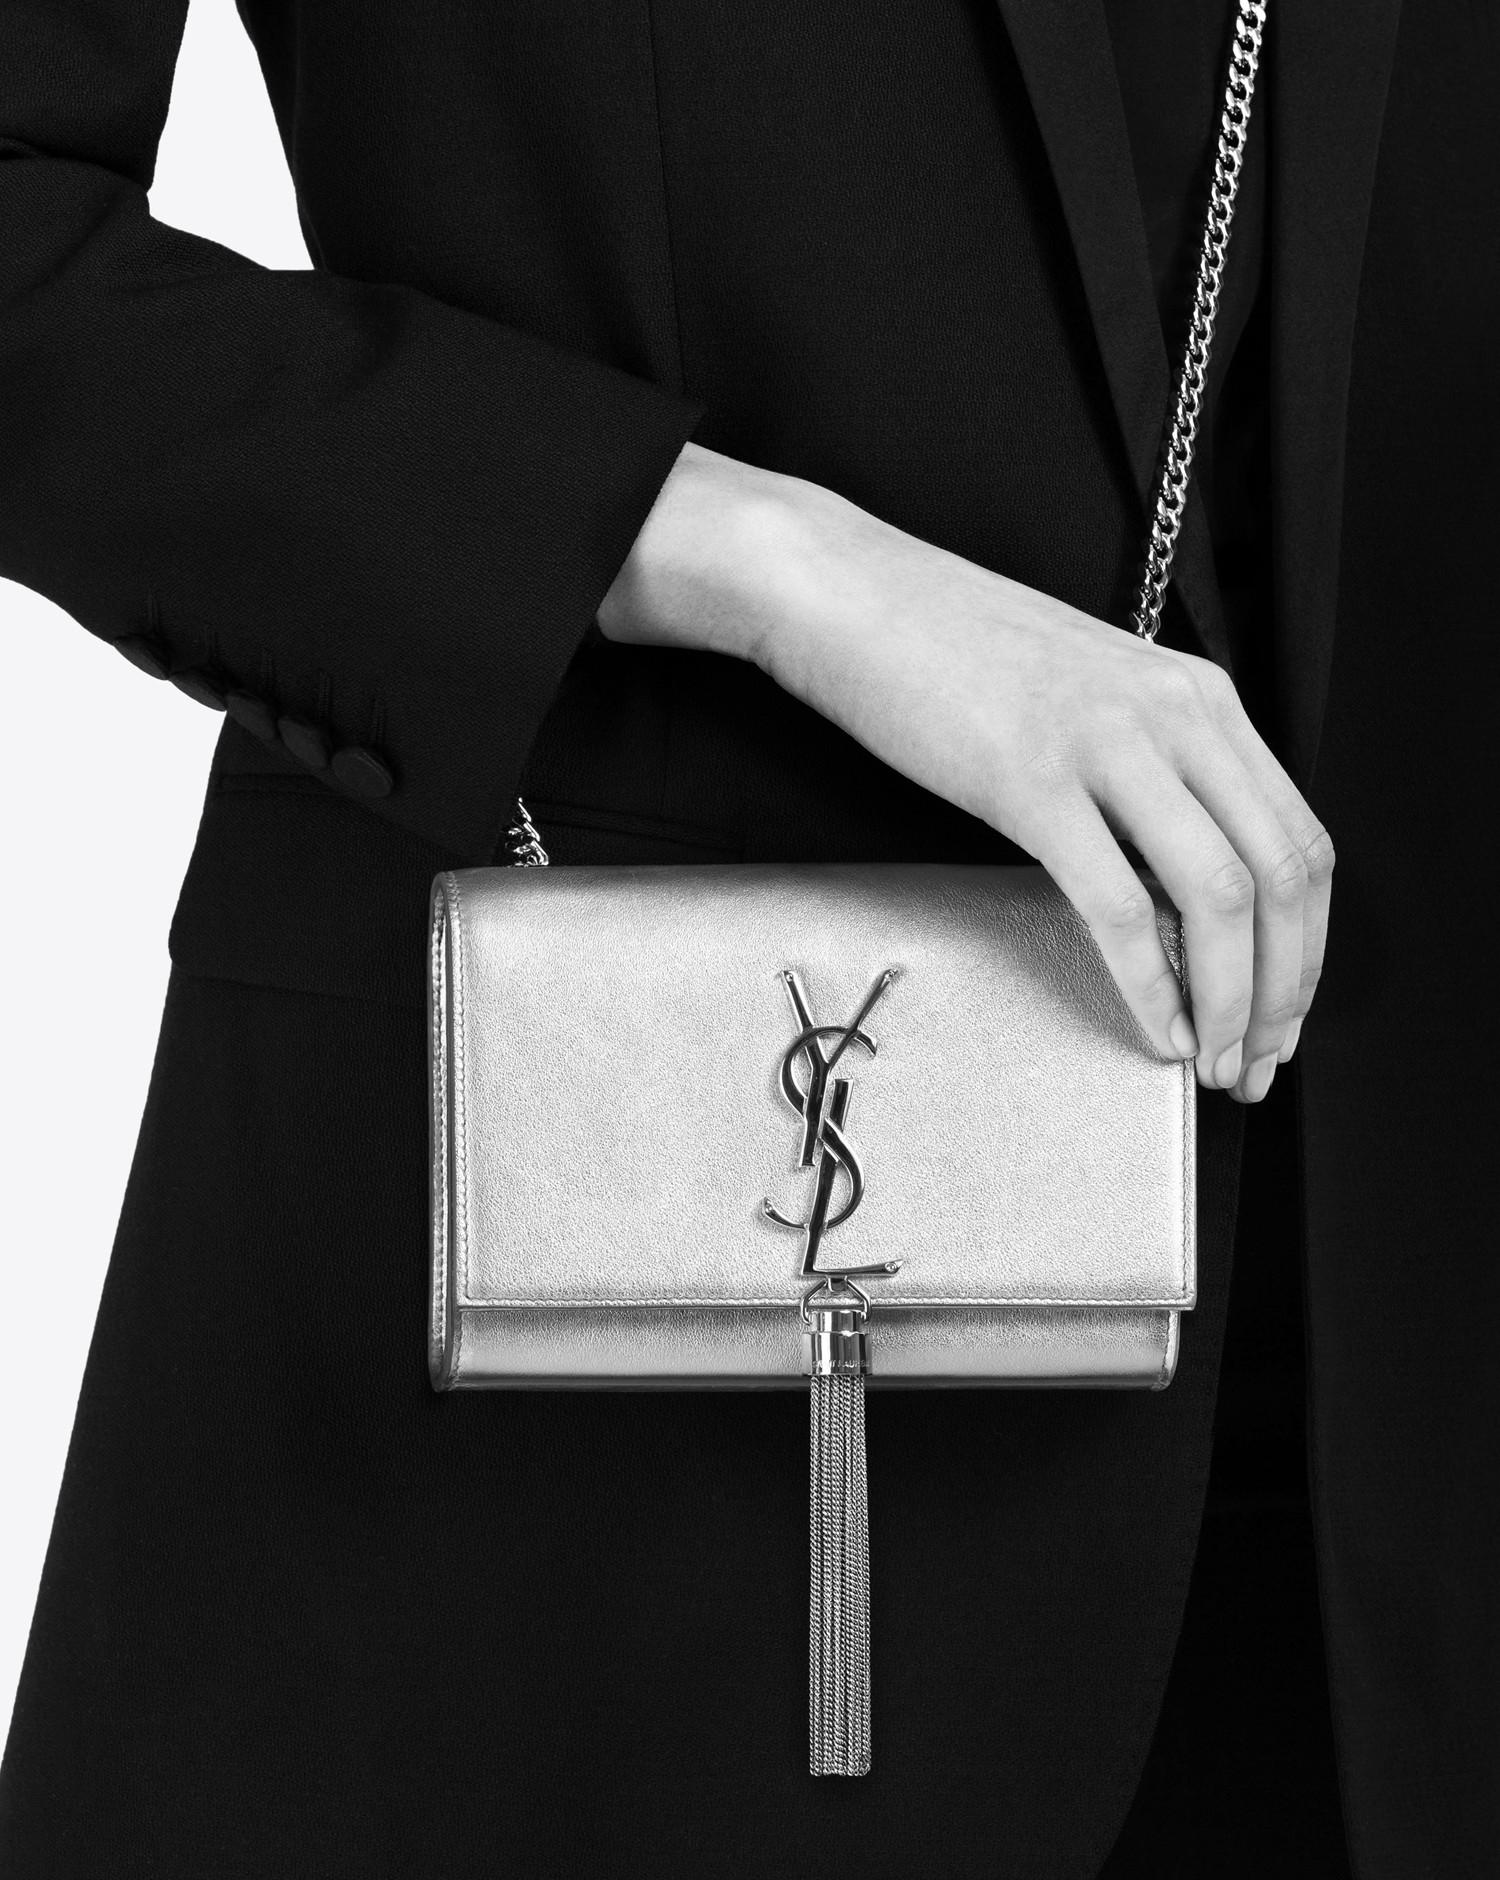 sacs handbags - Saint laurent Classic Small Kate Monogram Tassel Satchel In Silver ...